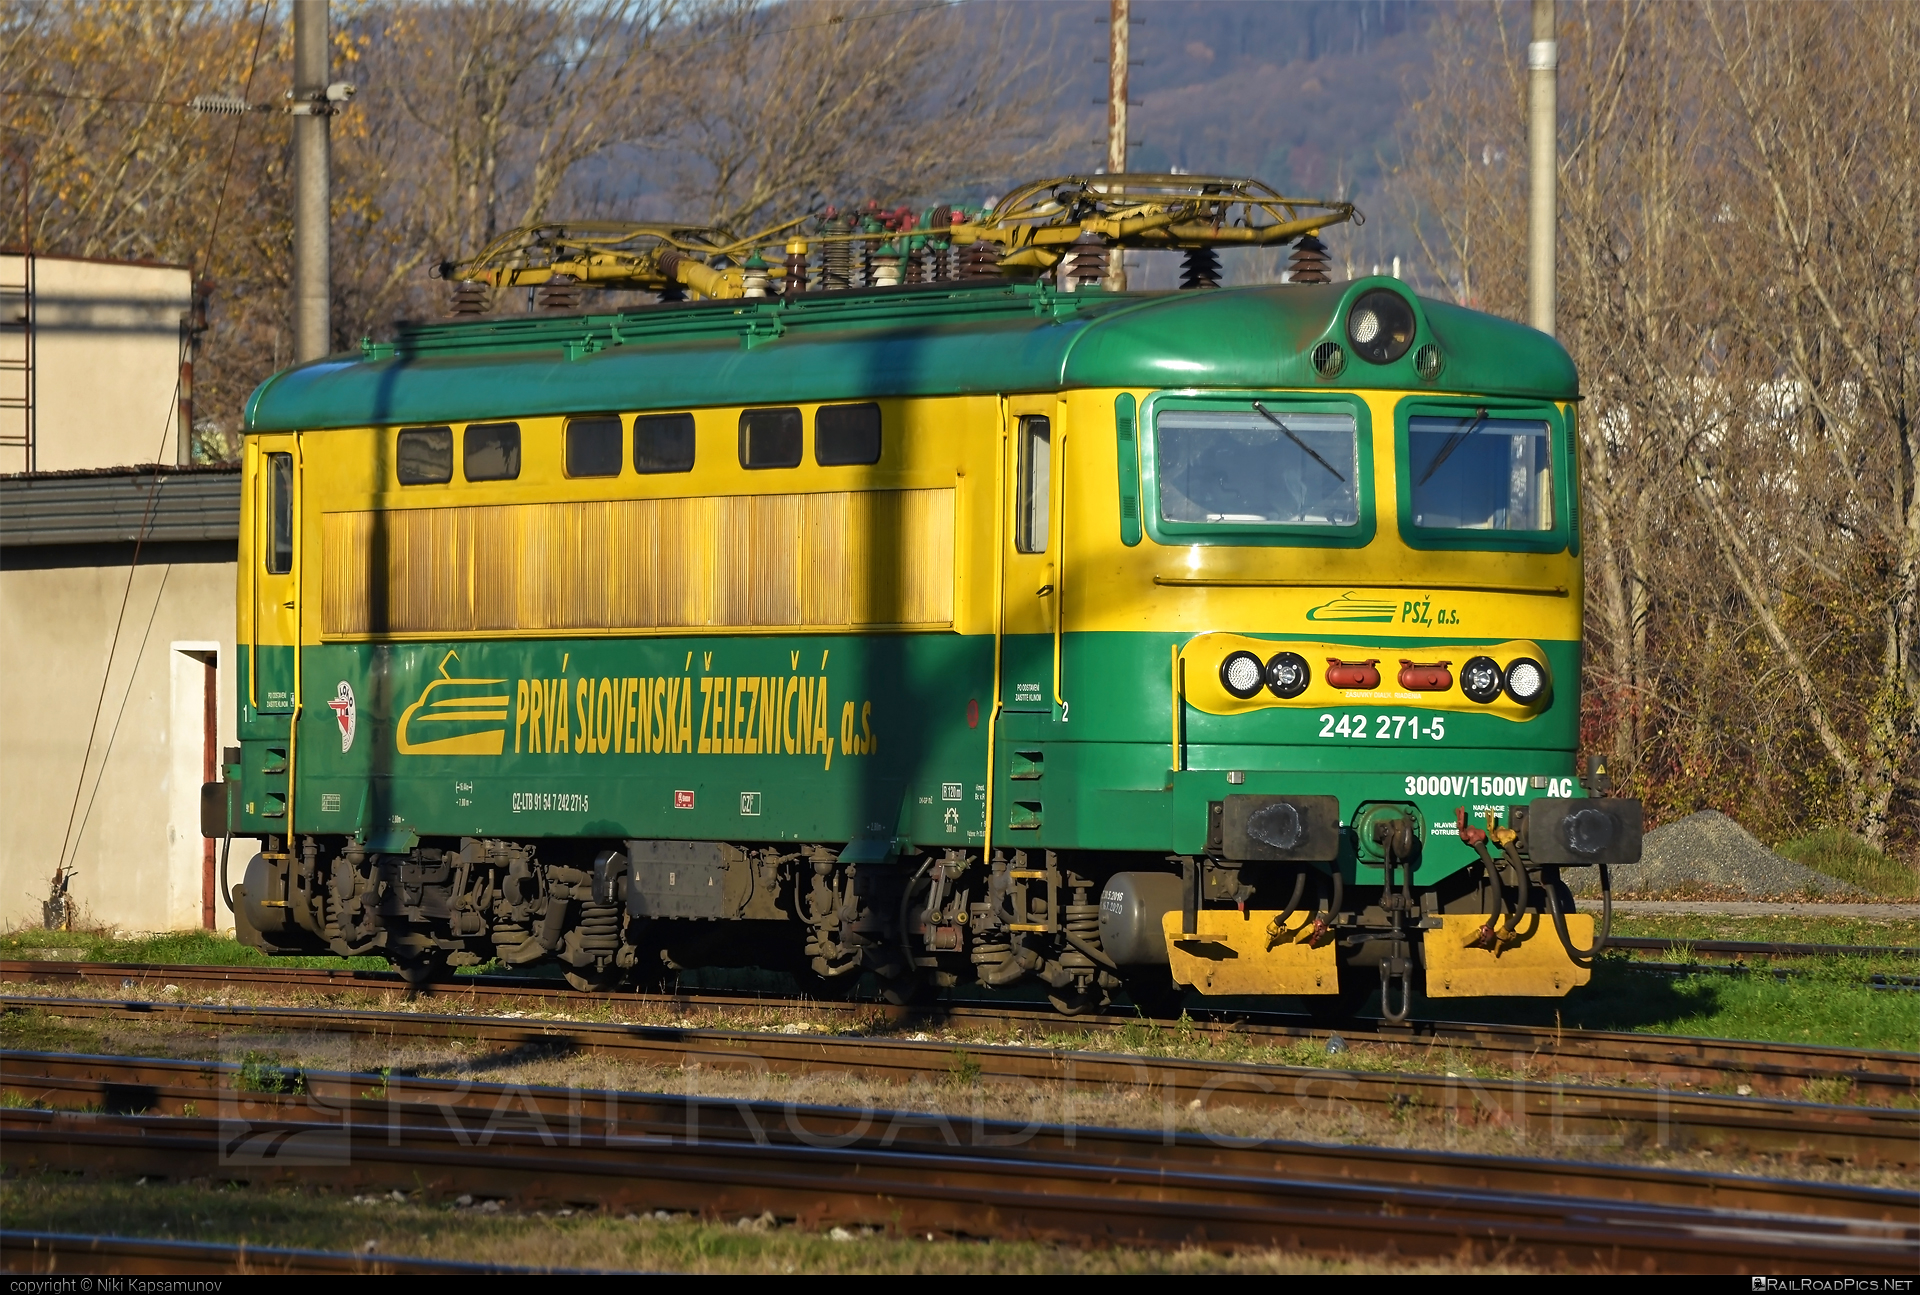 Škoda 73E - 242 271-5 operated by Prvá Slovenská železničná, a.s. #locomotive242 #plechac #prvaslovenskazeleznicna #prvaslovenskazeleznicnaas #psz #skoda #skoda73e